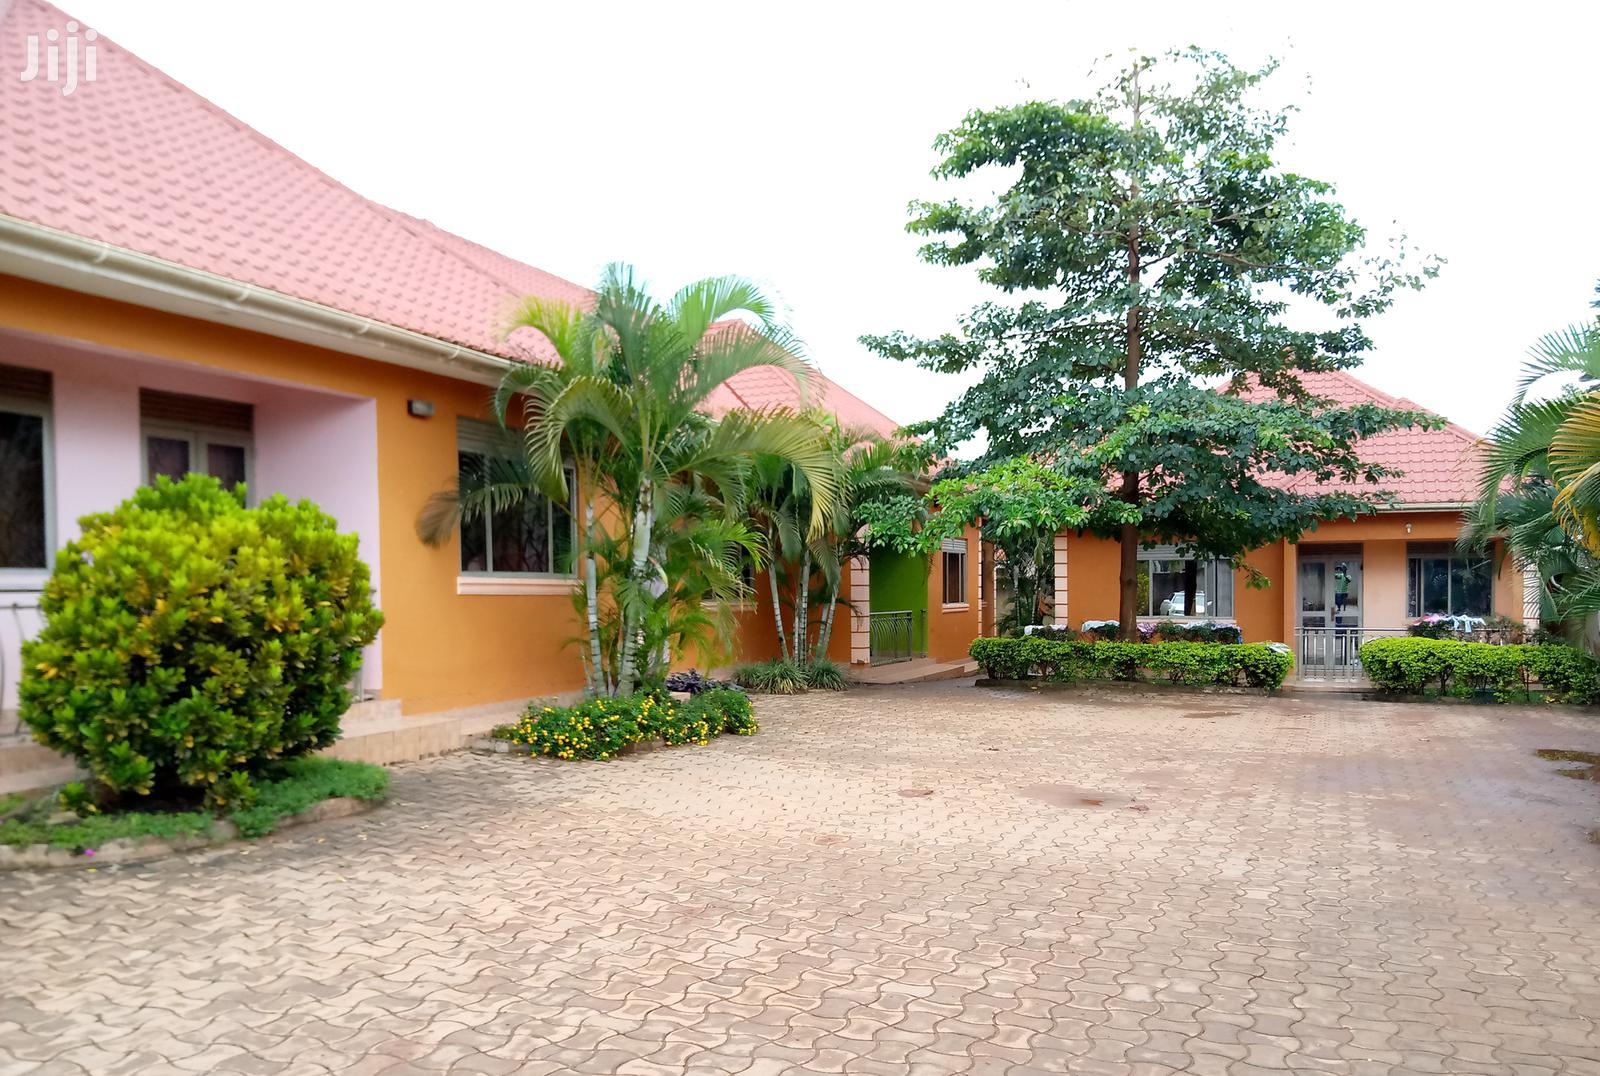 Najjera 2 Bedroom House For Rent F | Houses & Apartments For Rent for sale in Kampala, Central Region, Uganda